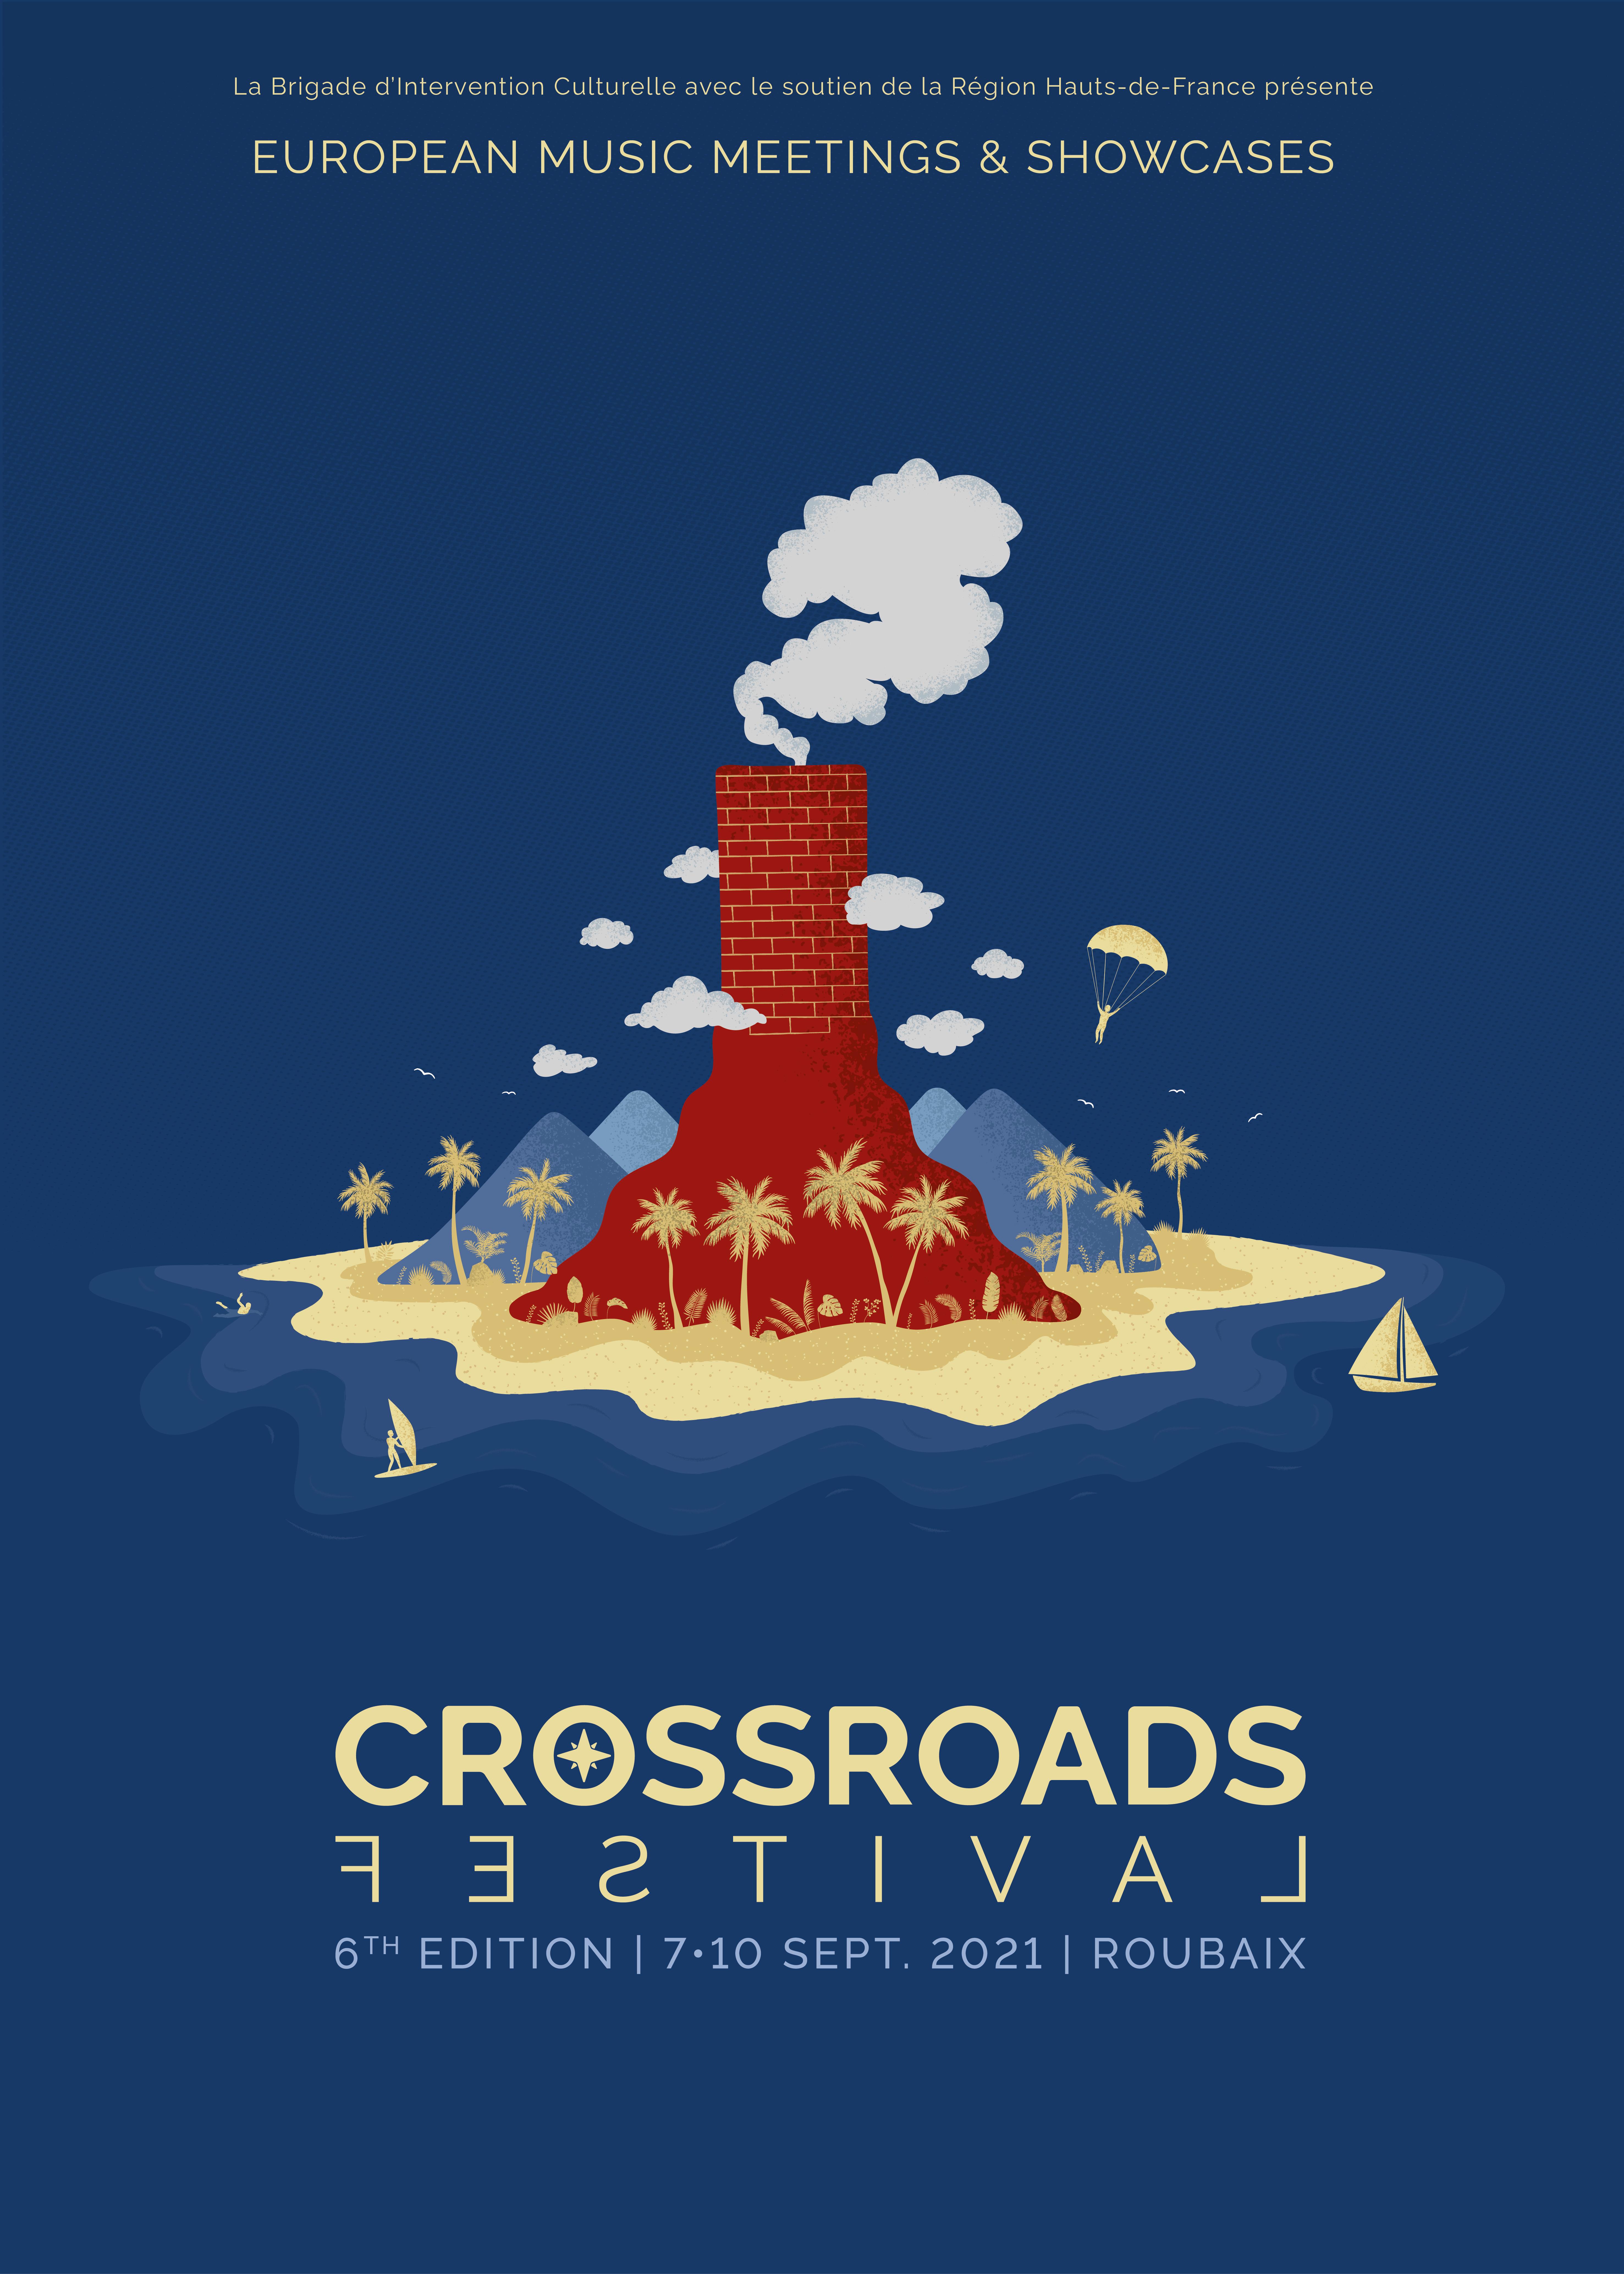 CROSSRADS FESTIVAL 2021